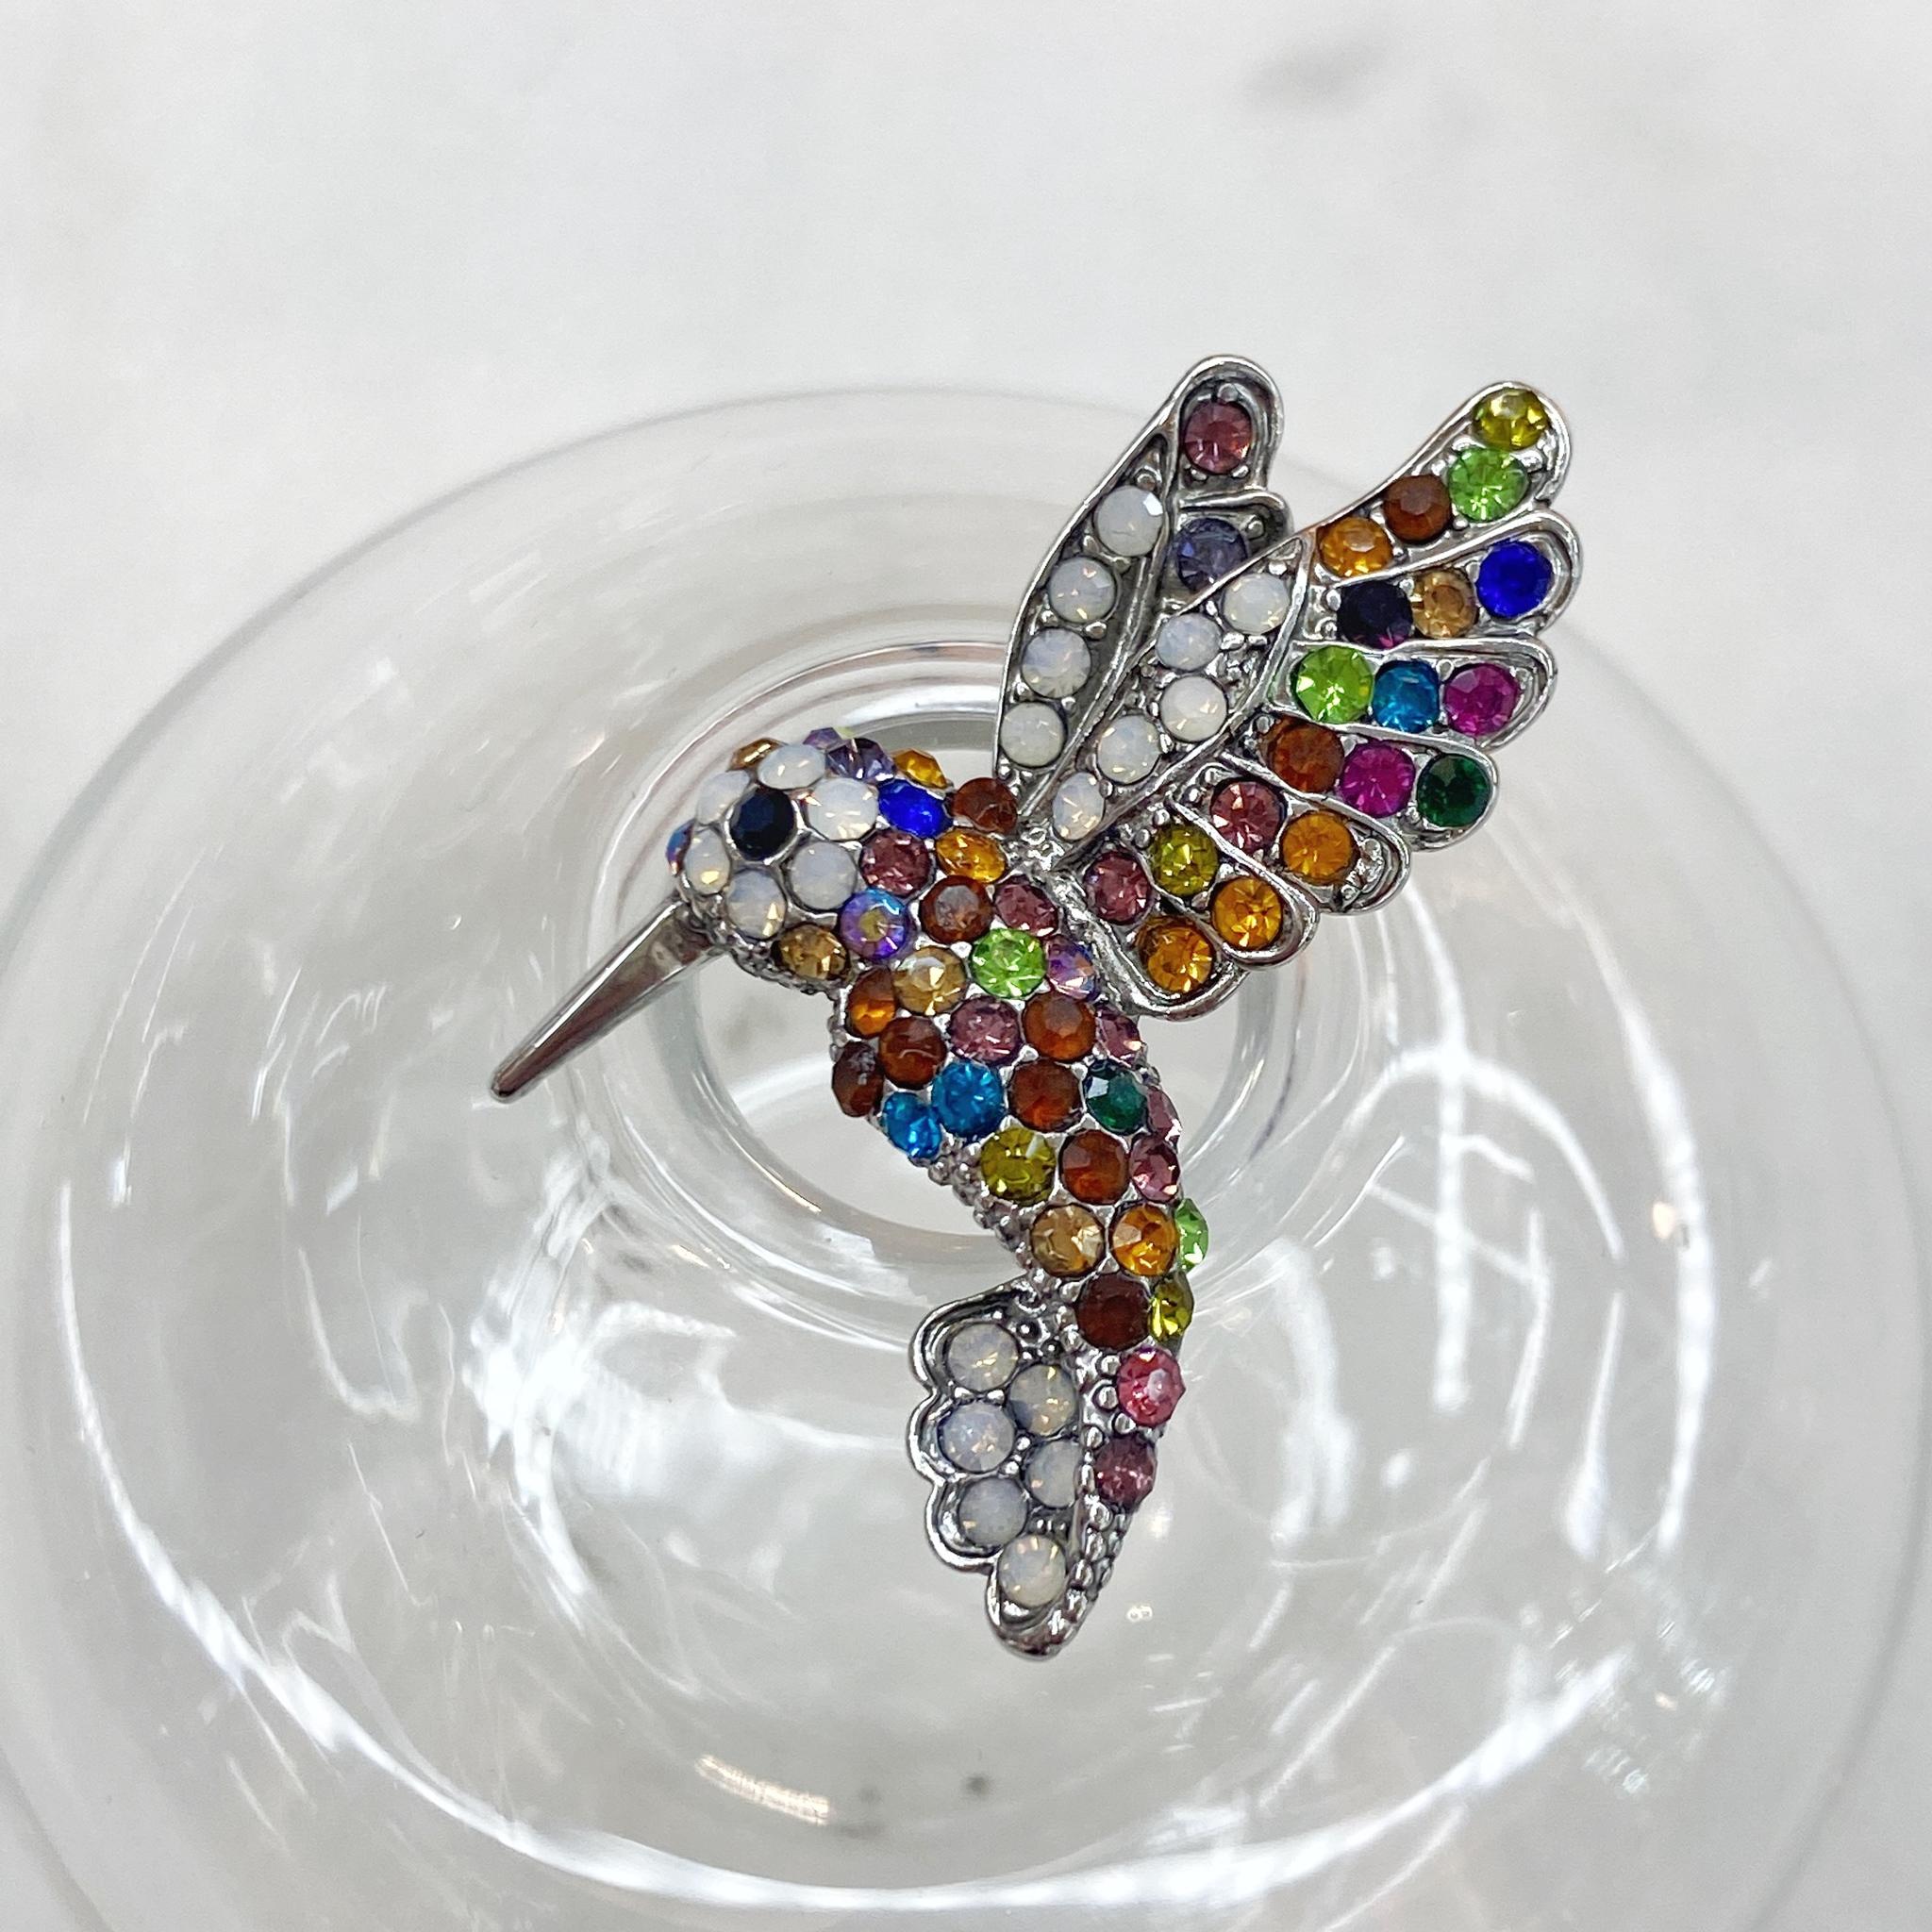 Брошь Птица Колибри фианиты мультицвет